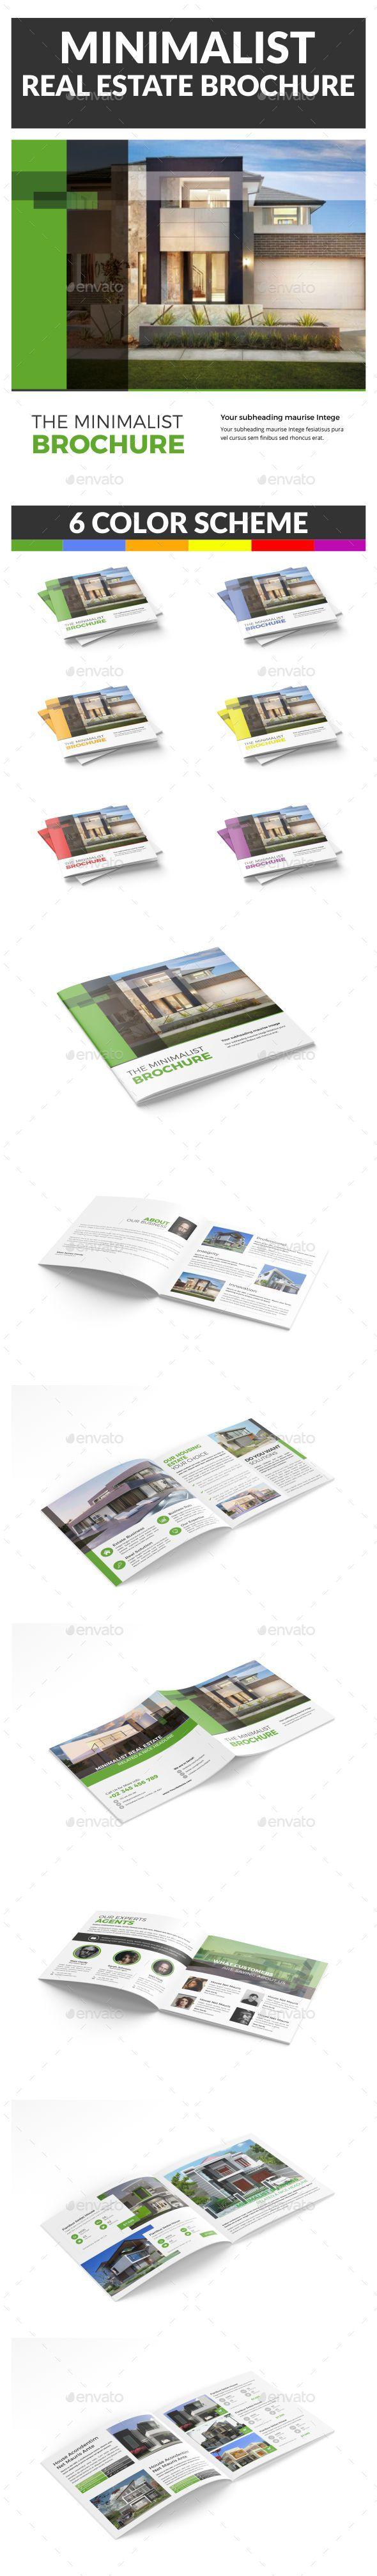 Minimalist Real Estate Brochure - Catalogs Brochures